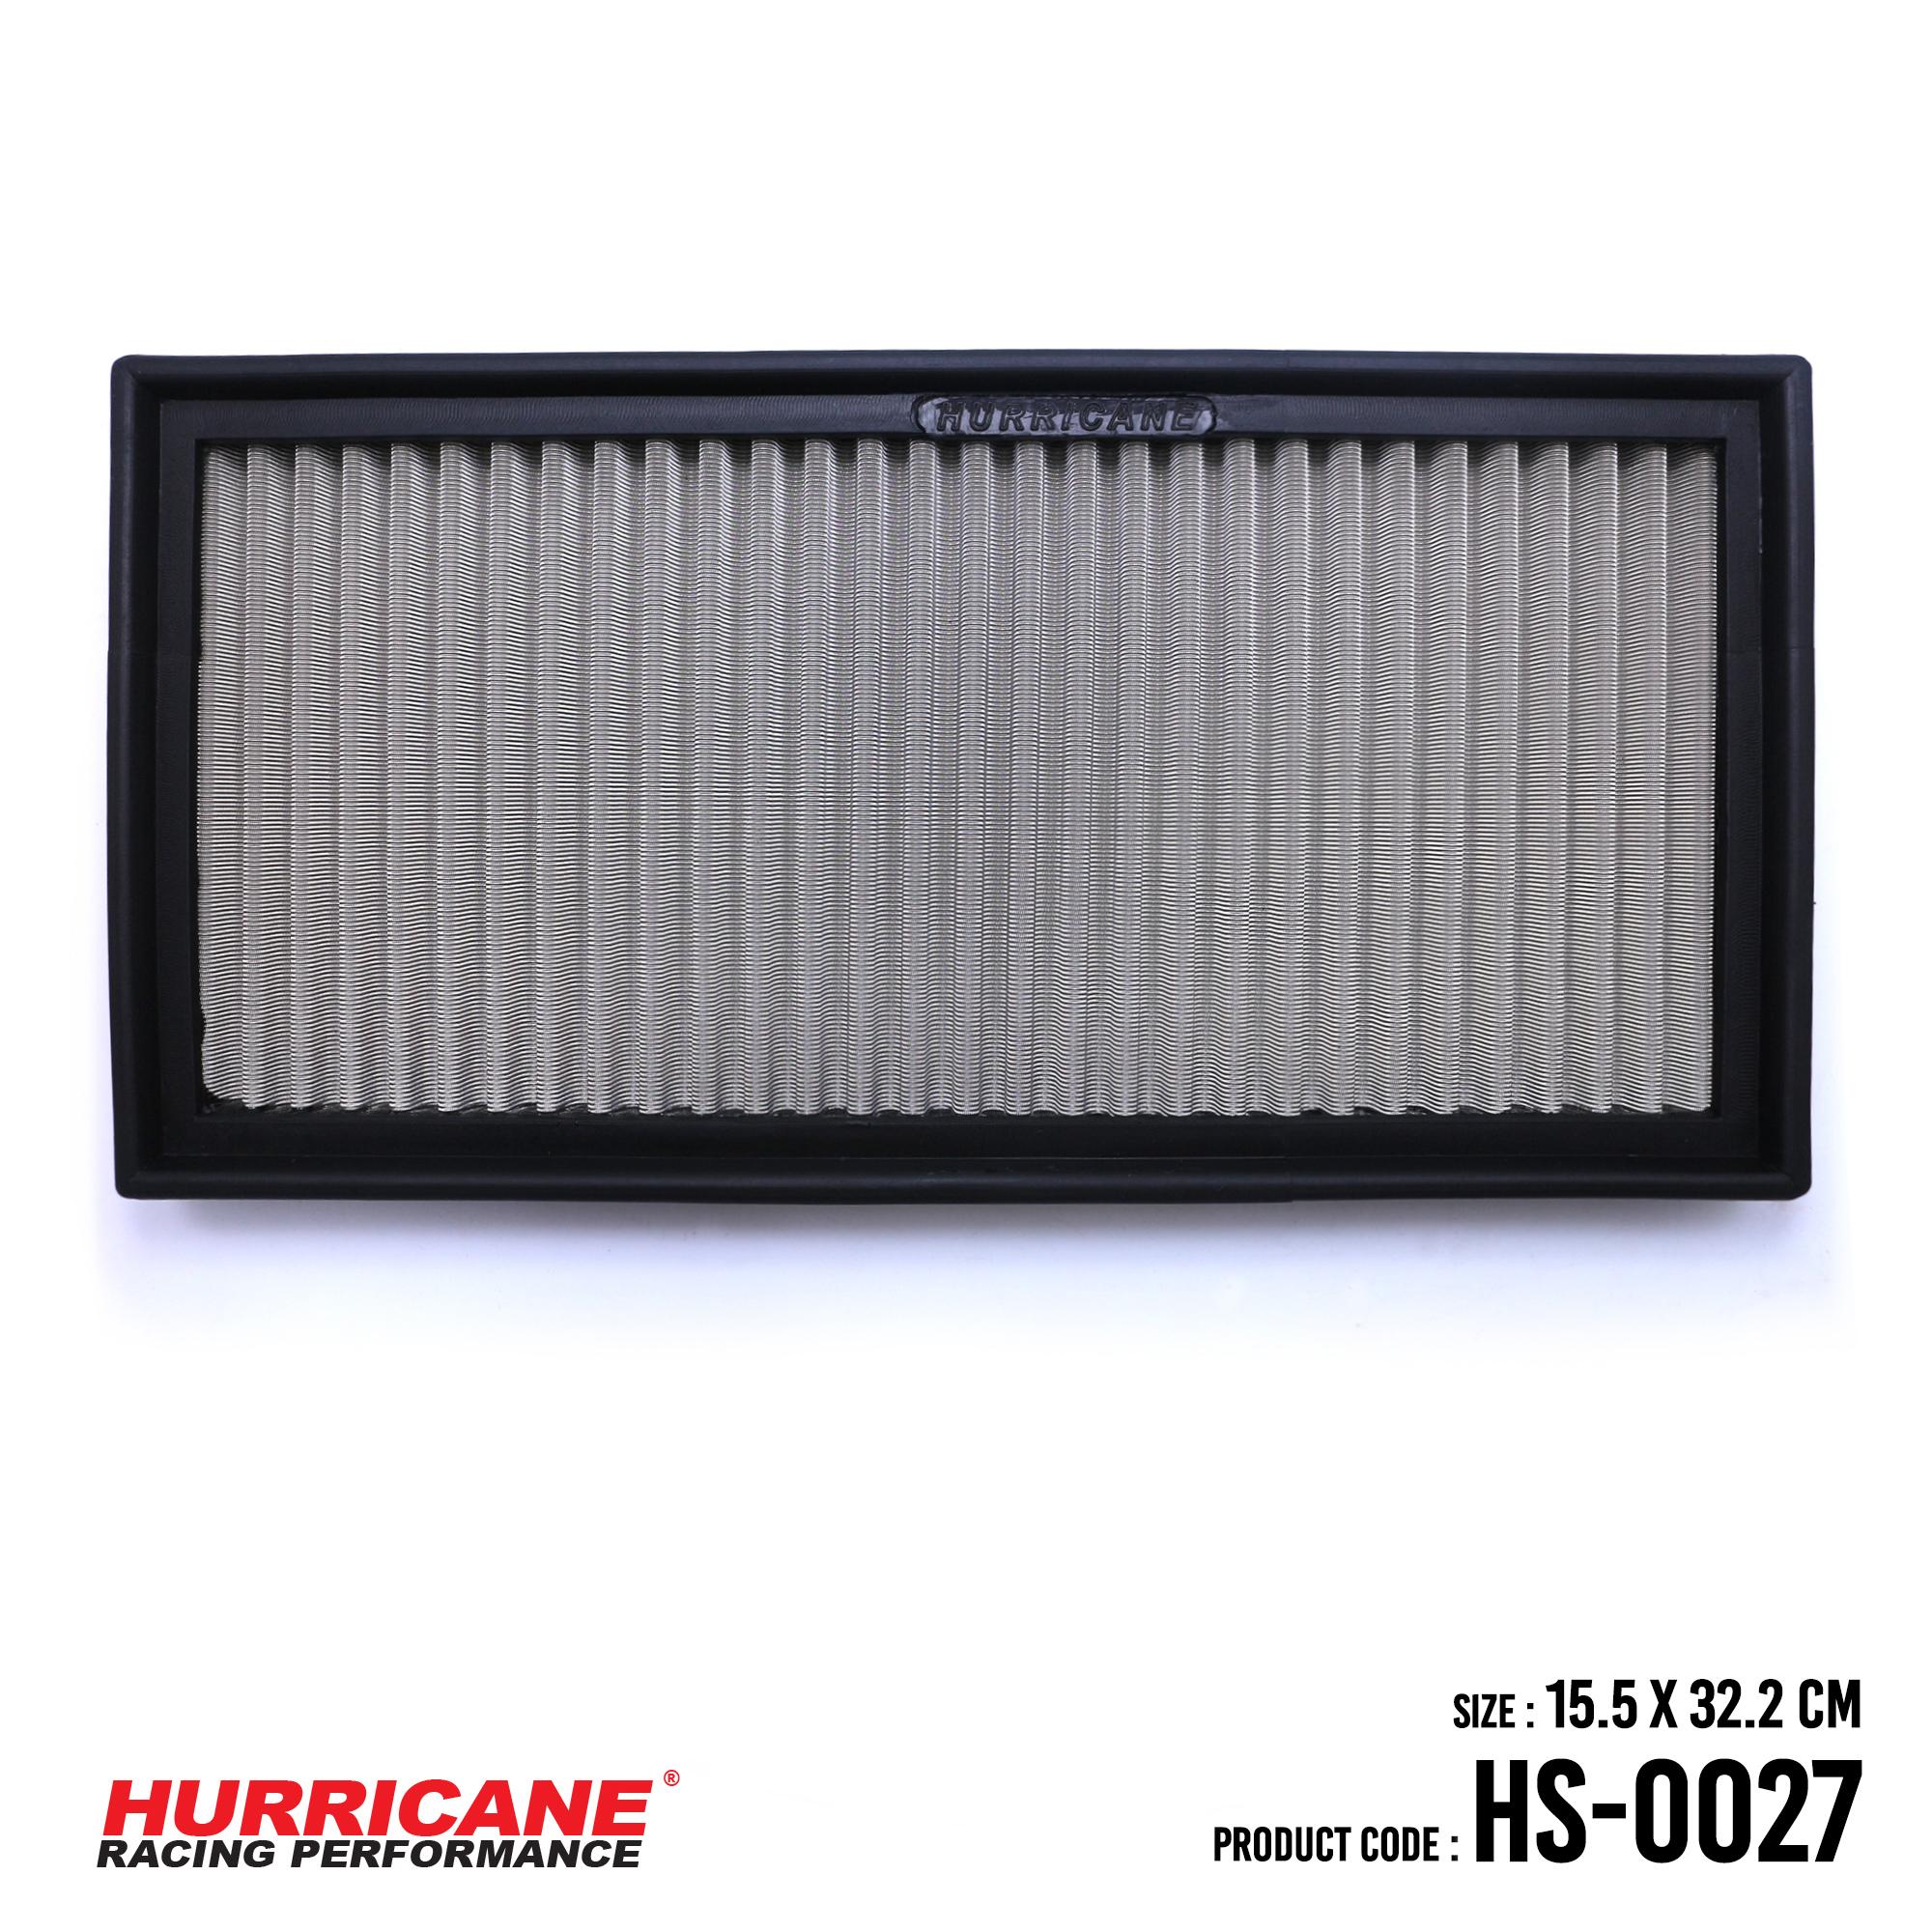 HURRICANE STAINLESS STEEL AIR FILTER FOR HS-0027 CitroenFiatLanciaPeugeot